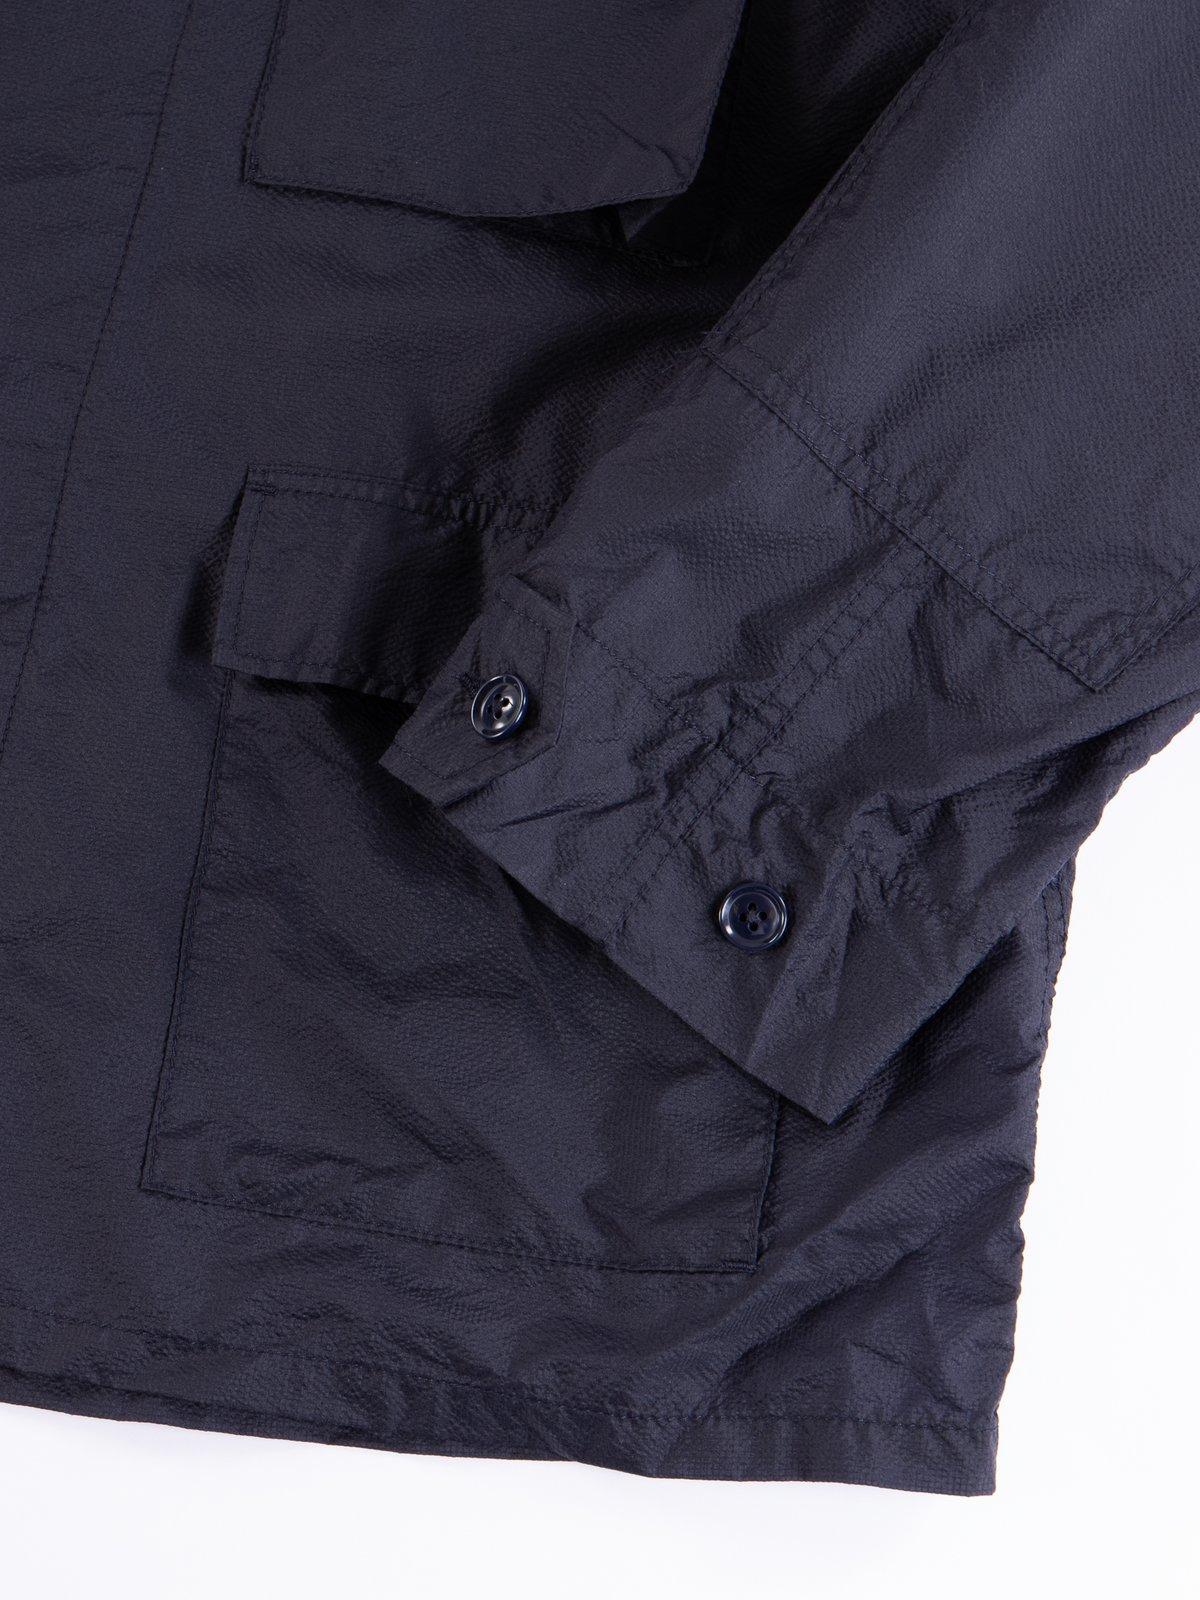 Dark Navy Nylon Micro Ripstop BDU Jacket - Image 4